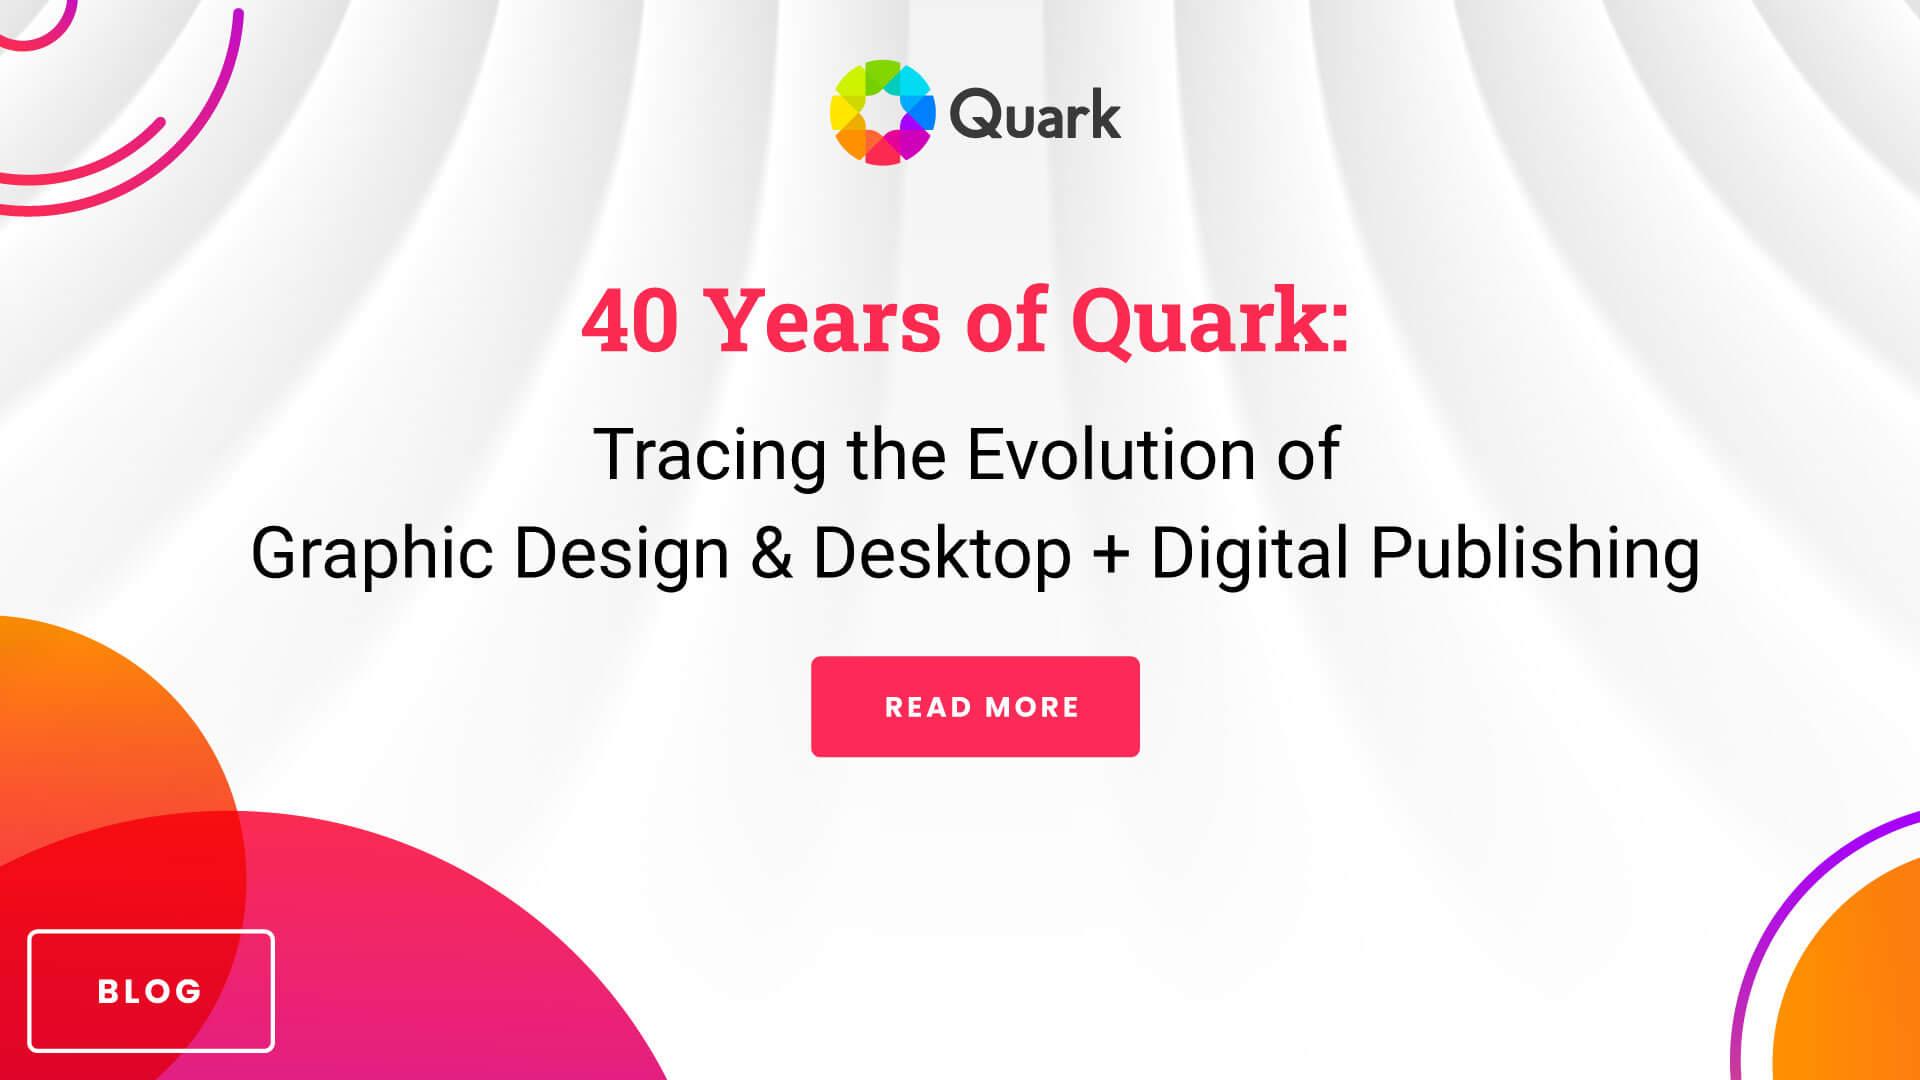 40 Years of Quark: Tracing the Evolution of Graphic Design & Desktop + Digital Publishing